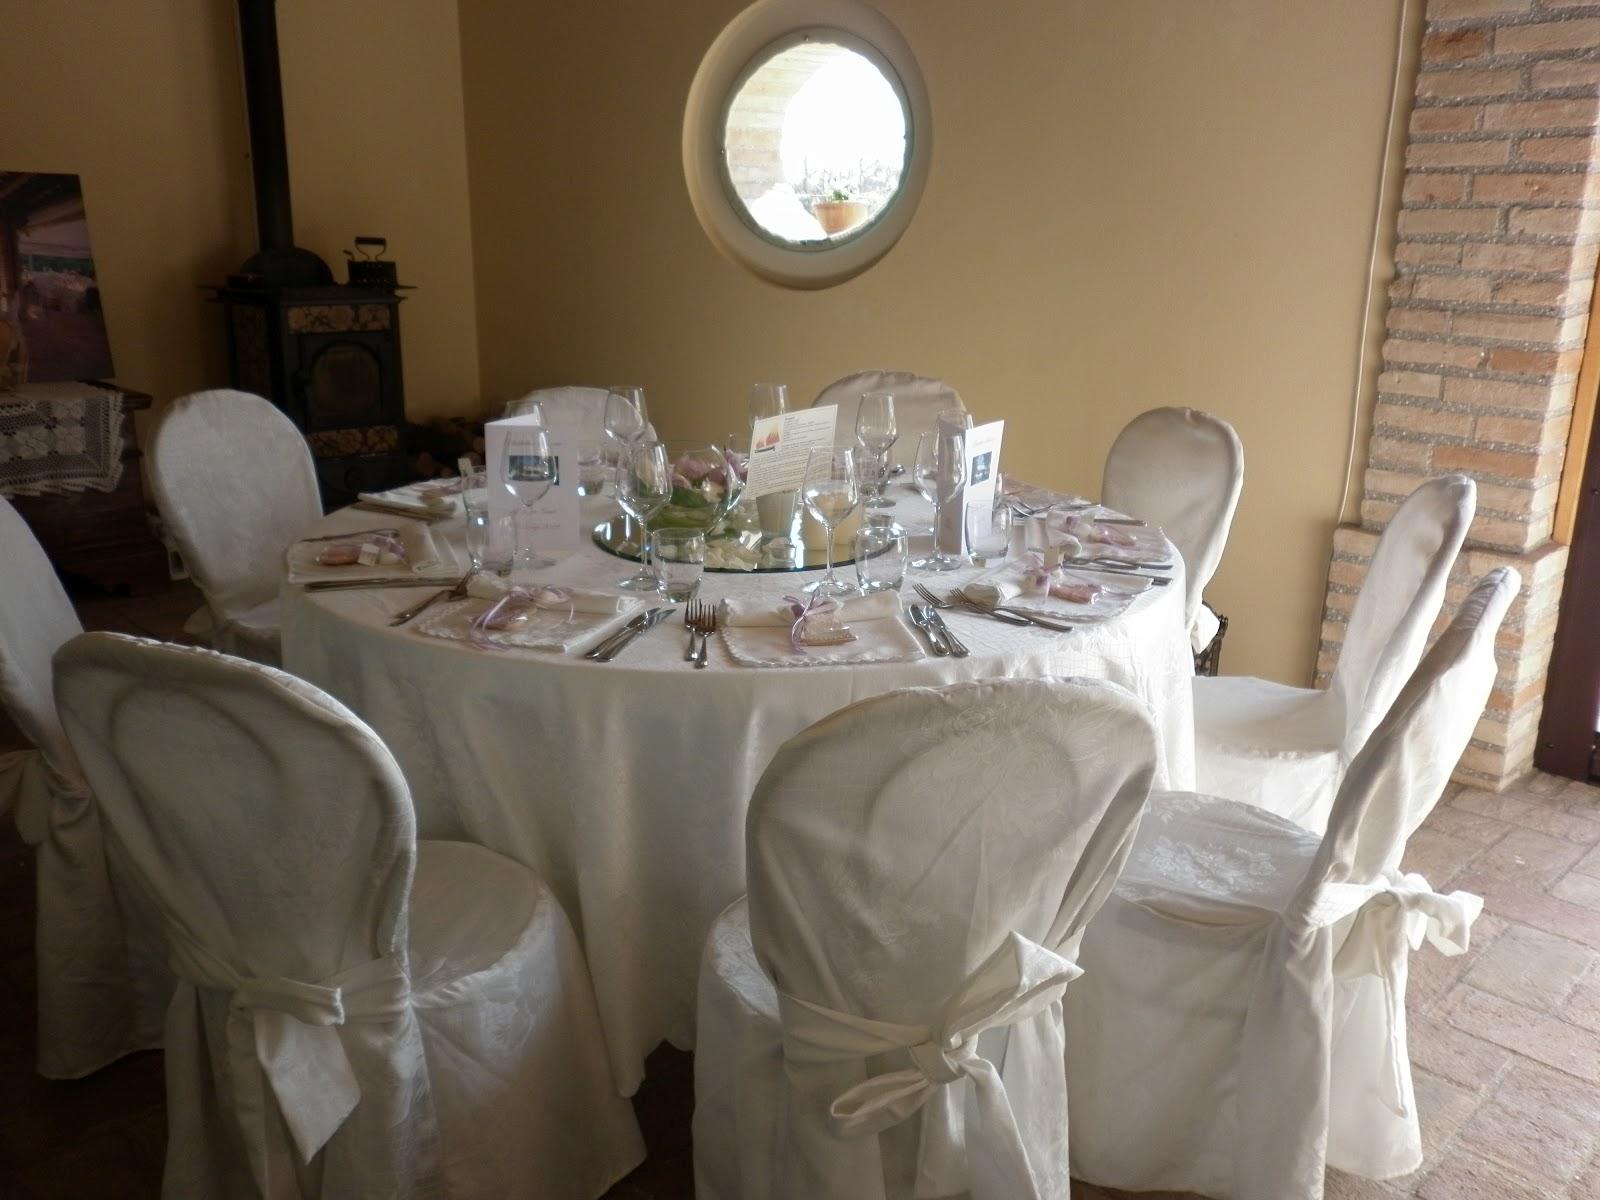 Allestimenti Floreali Matrimonio Country Chic : Mareventi wedding planner ravenna allestimenti floreali